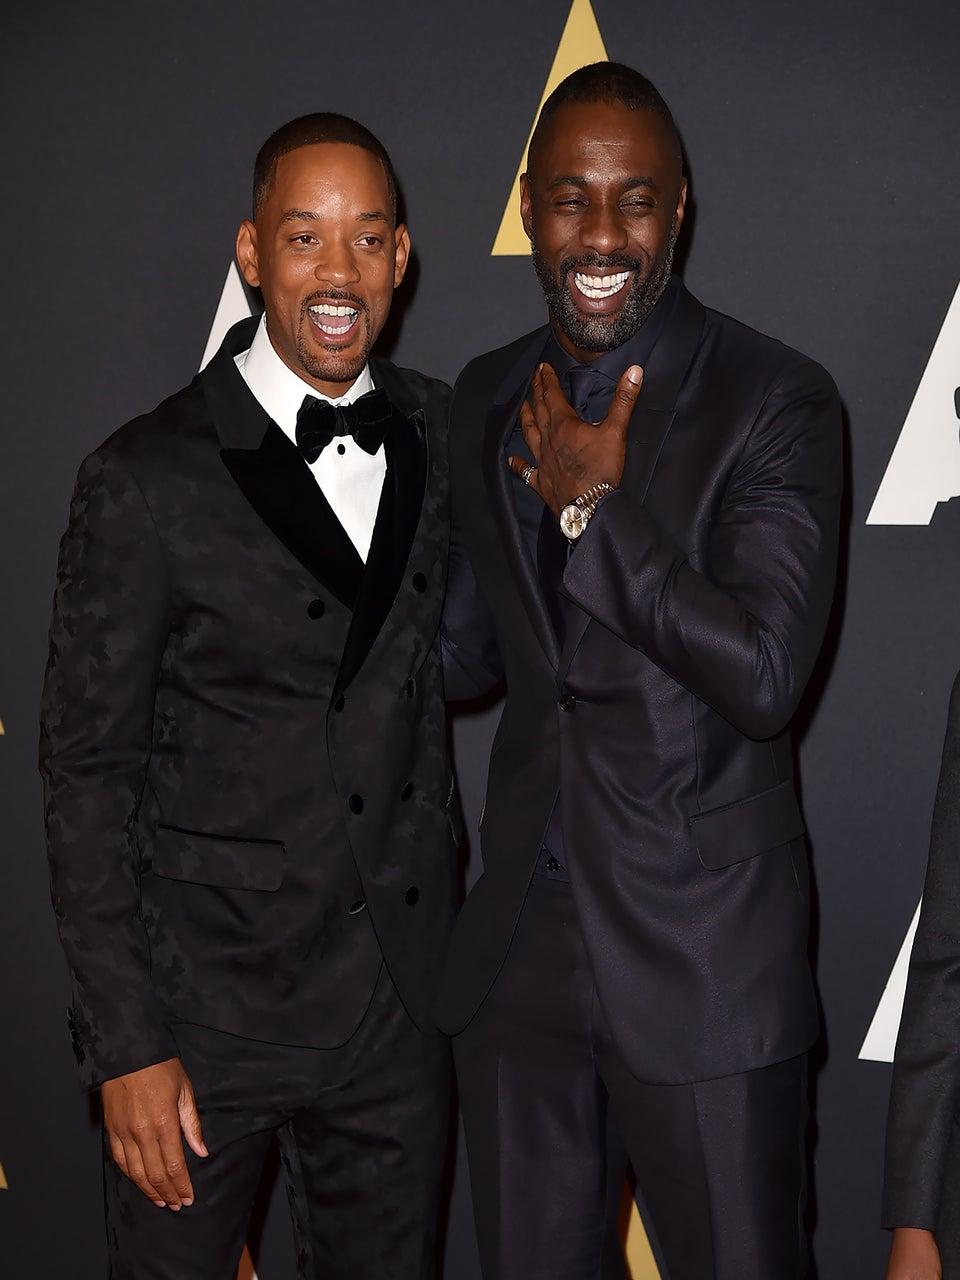 Idris Elba Scores 2 Golden Globe Noms, Uzo Aduba, Will Smith, Queen Latifah Earn Nods Too